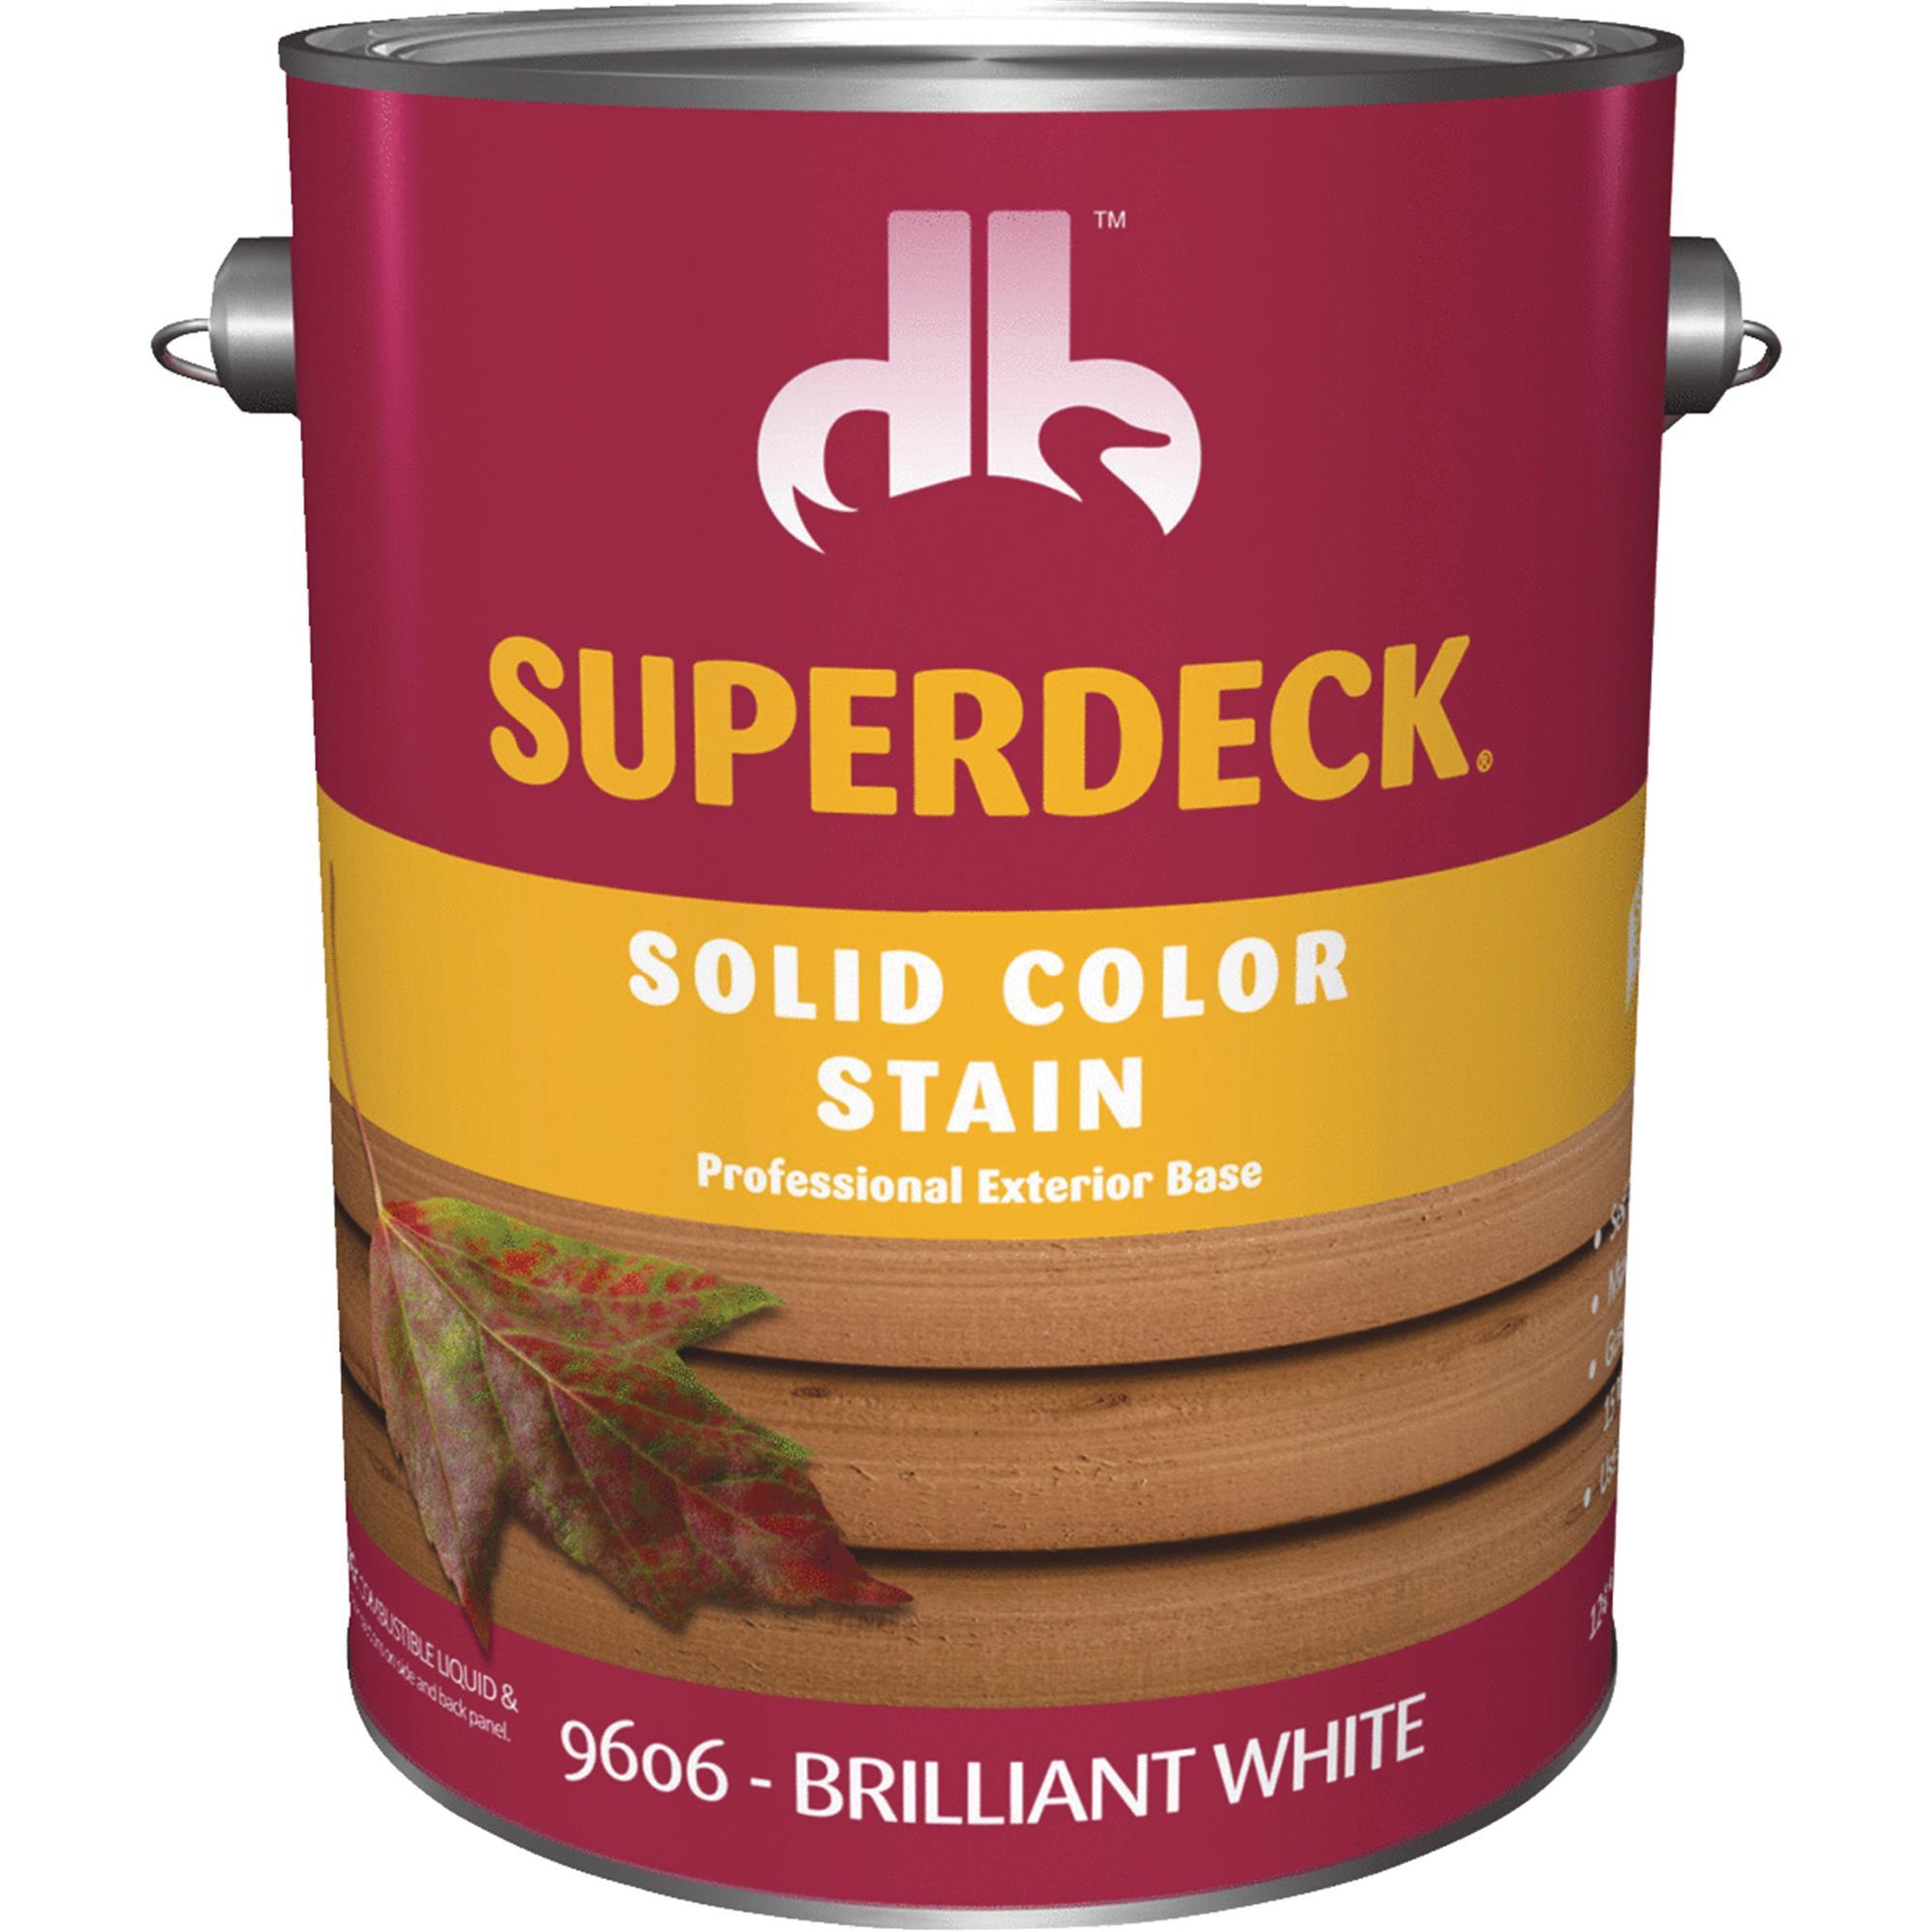 Duckback SUPERDECK Self Priming Solid Color Stain